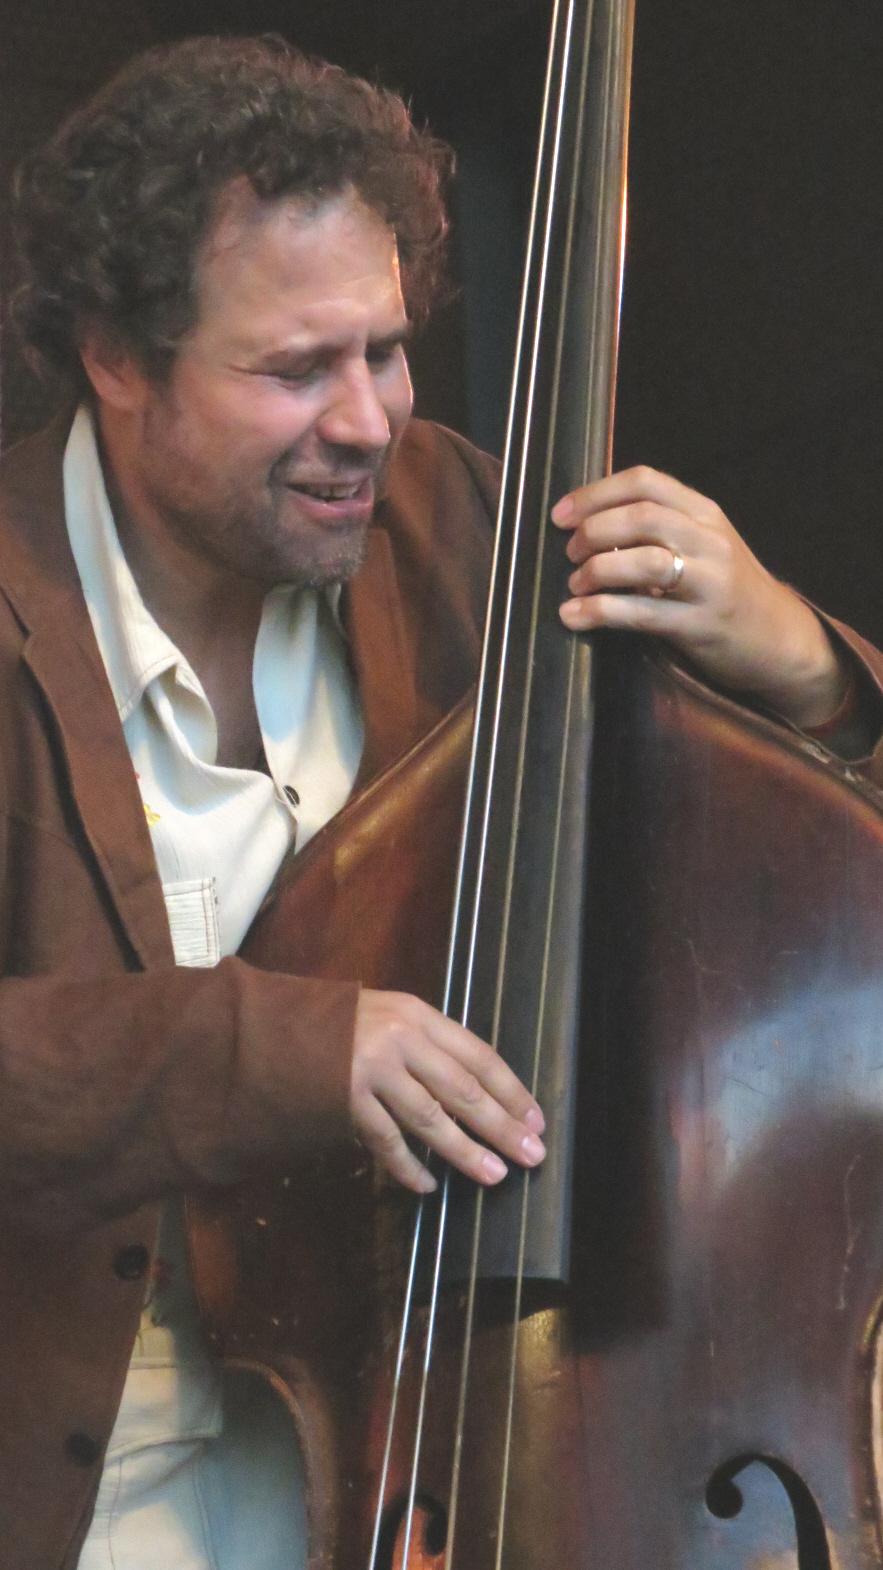 Joshua abrahams with hamid drake and bindu at 2013 chicago jazz festival